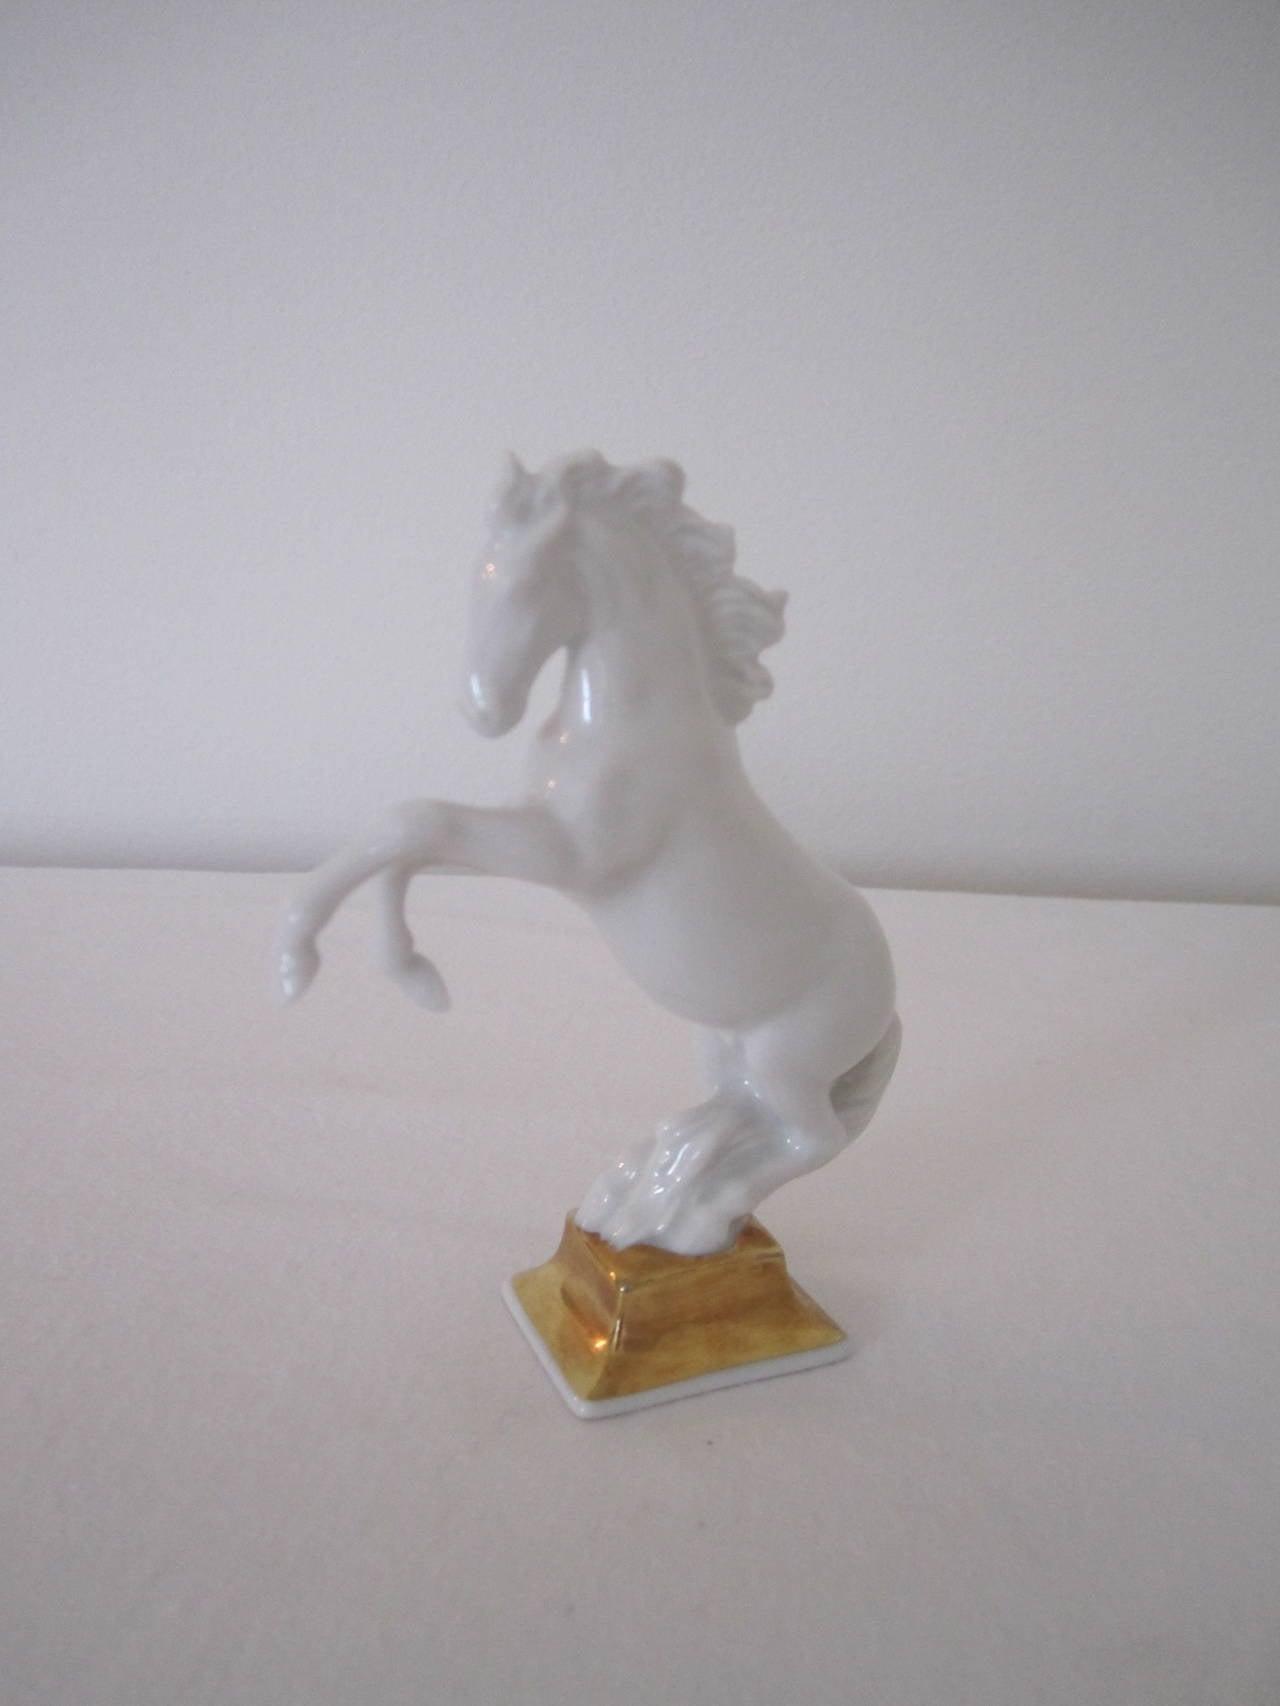 Glazed Blanc-de-Chine Porcelain Horse Sculpture by Max Hermann Fritz for Rosenthal